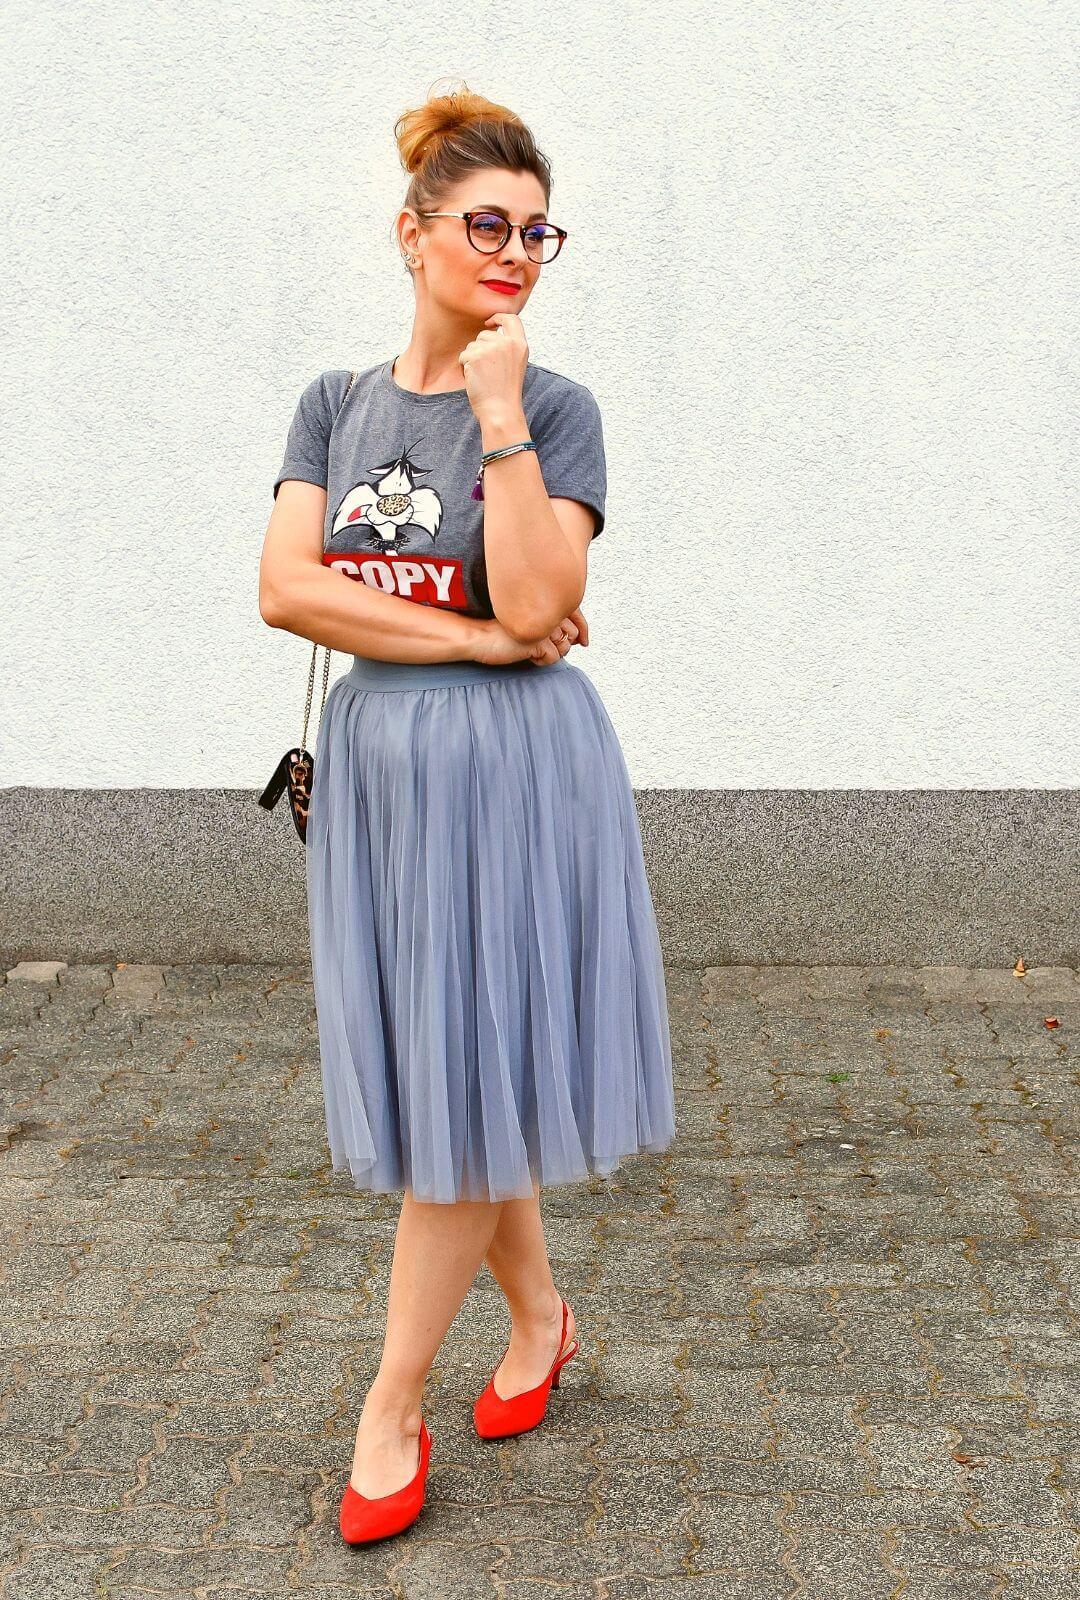 Tüllrock-Outfit-Grau